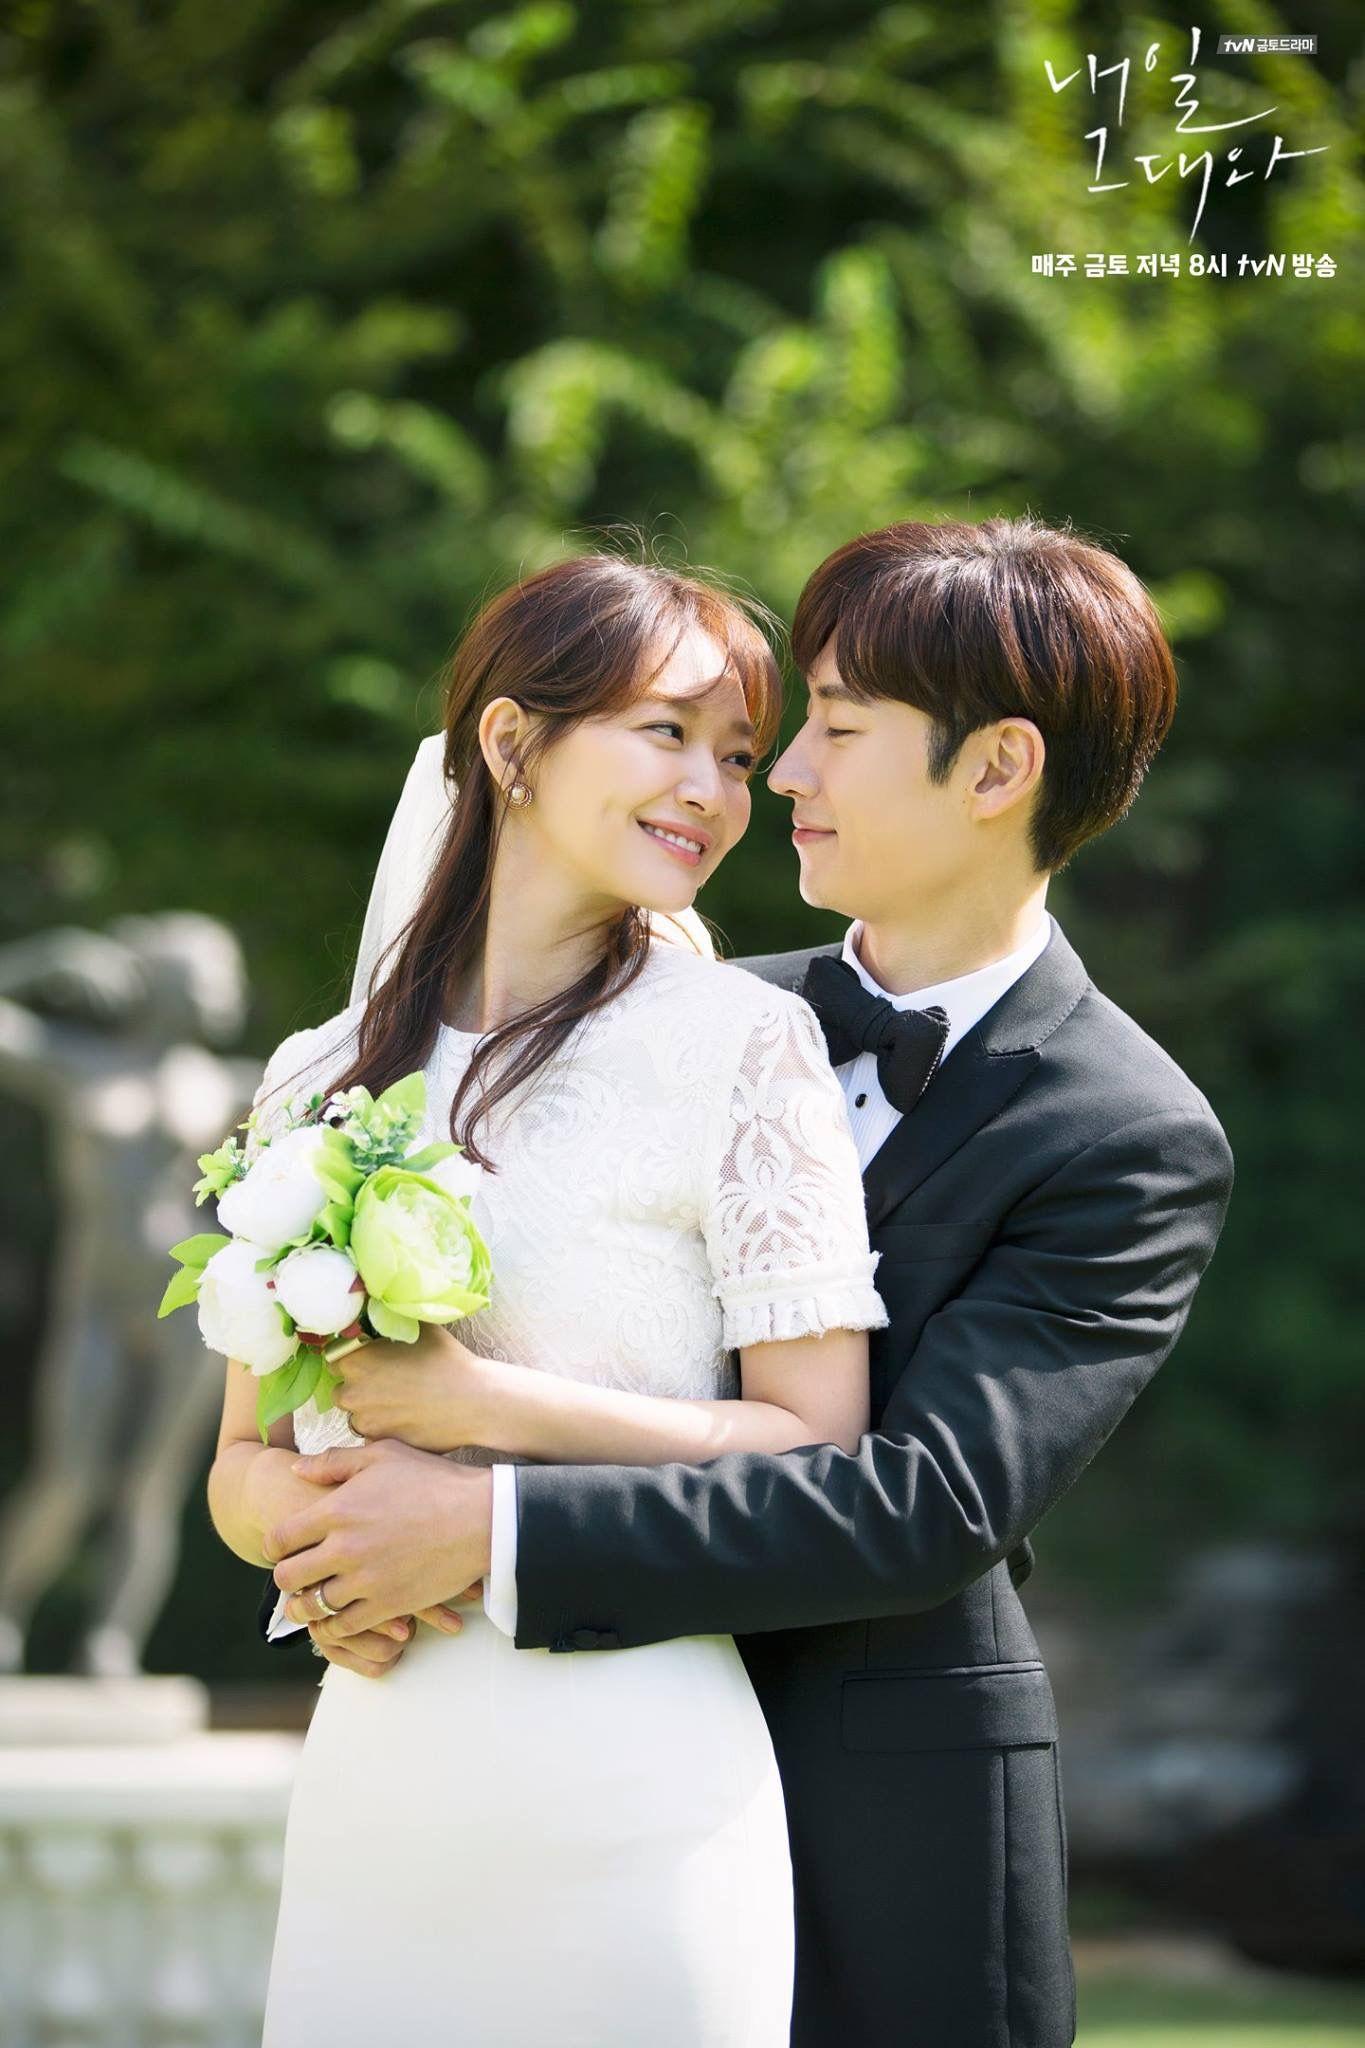 Pin On Korean Drama Movie